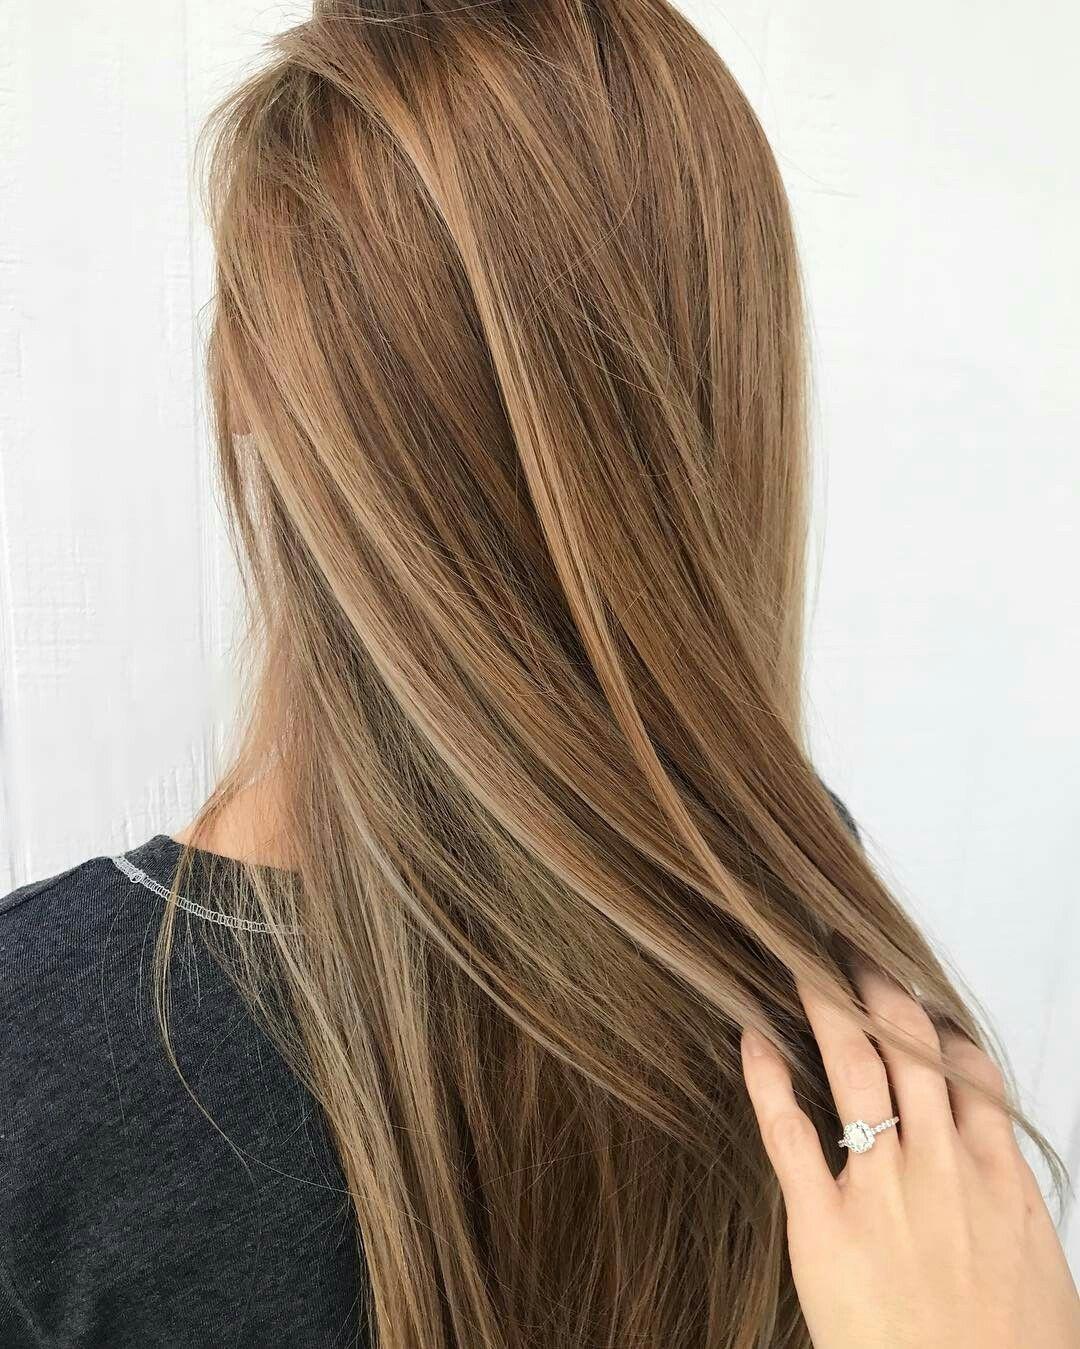 Pin by melissa keller on hair color cuts u styles i loveuc